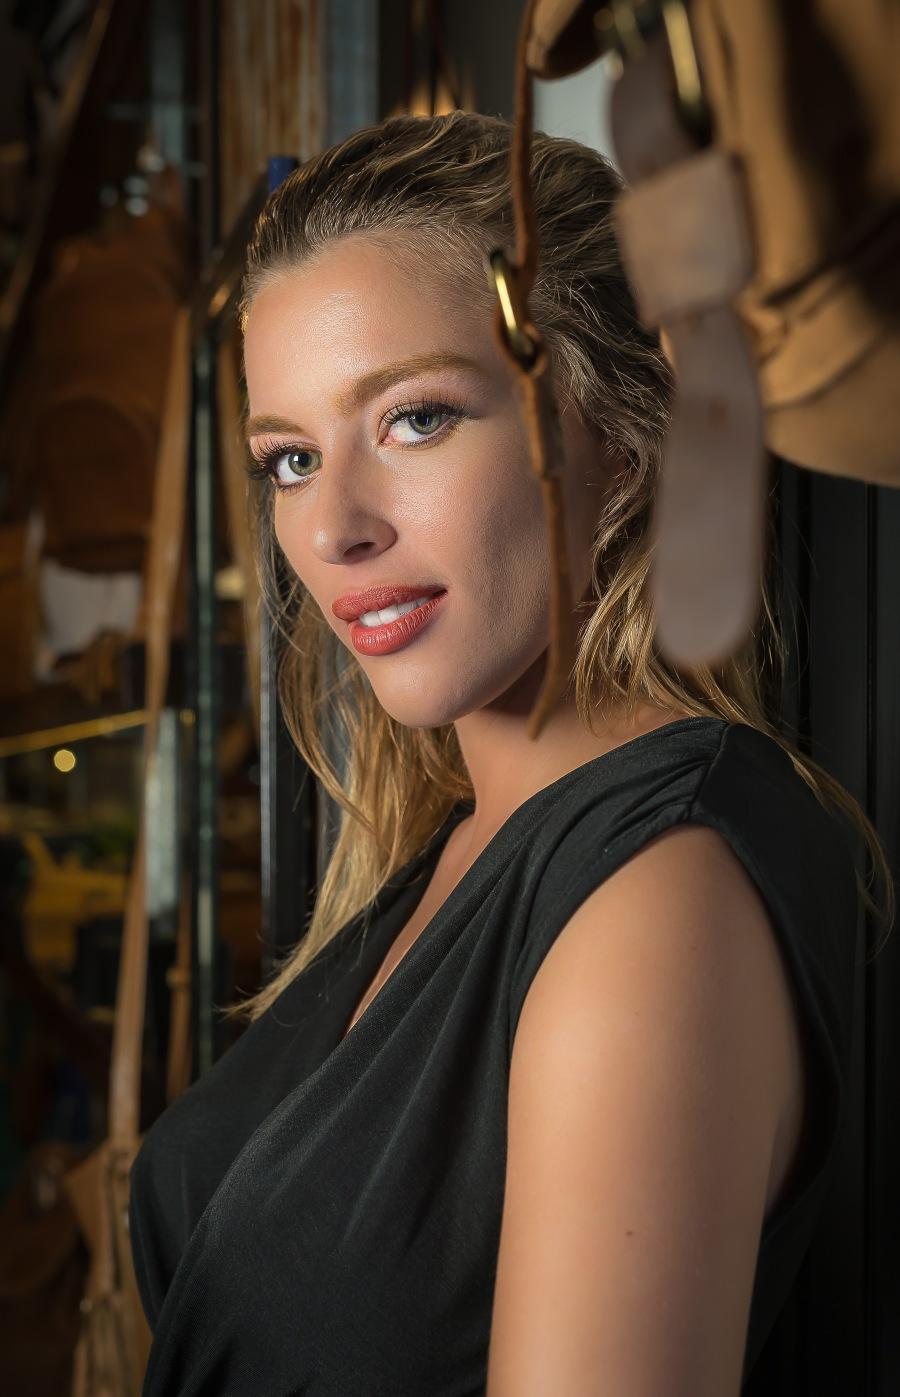 Model Nikkita Hall